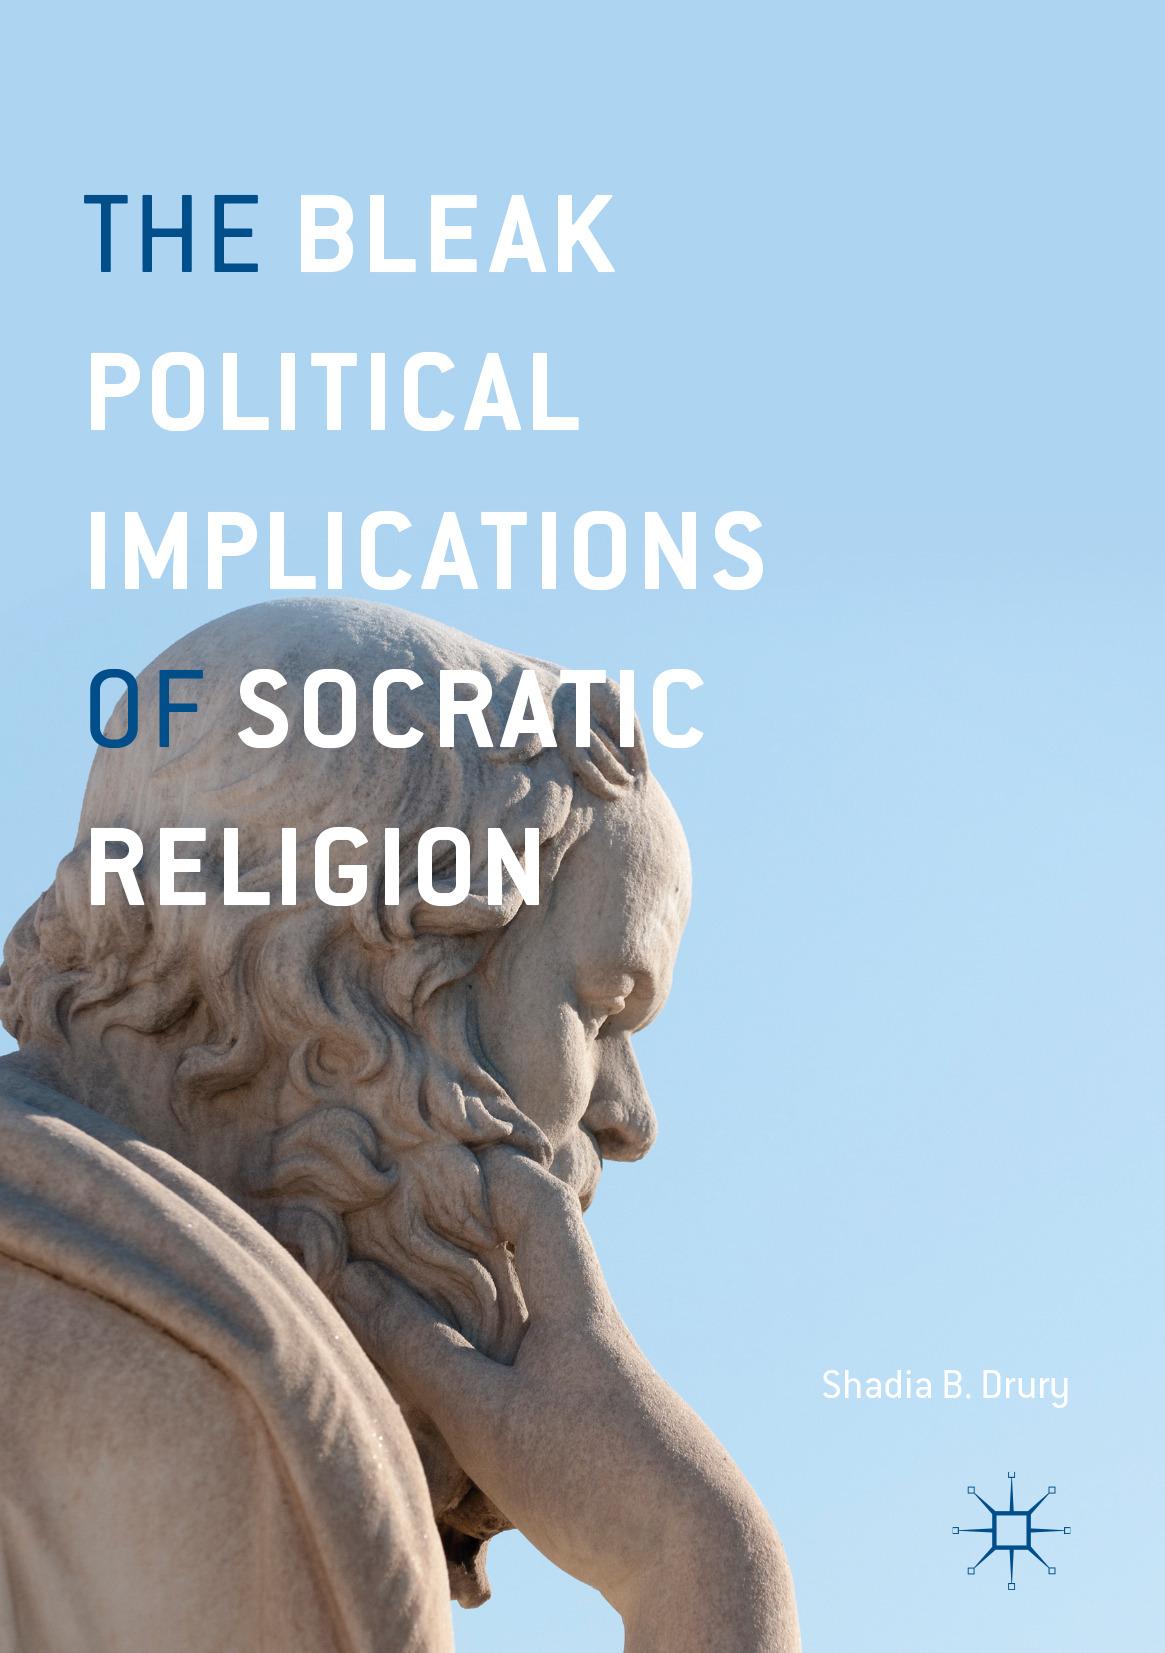 Drury, Shadia B. - The Bleak Political Implications of Socratic Religion, ebook